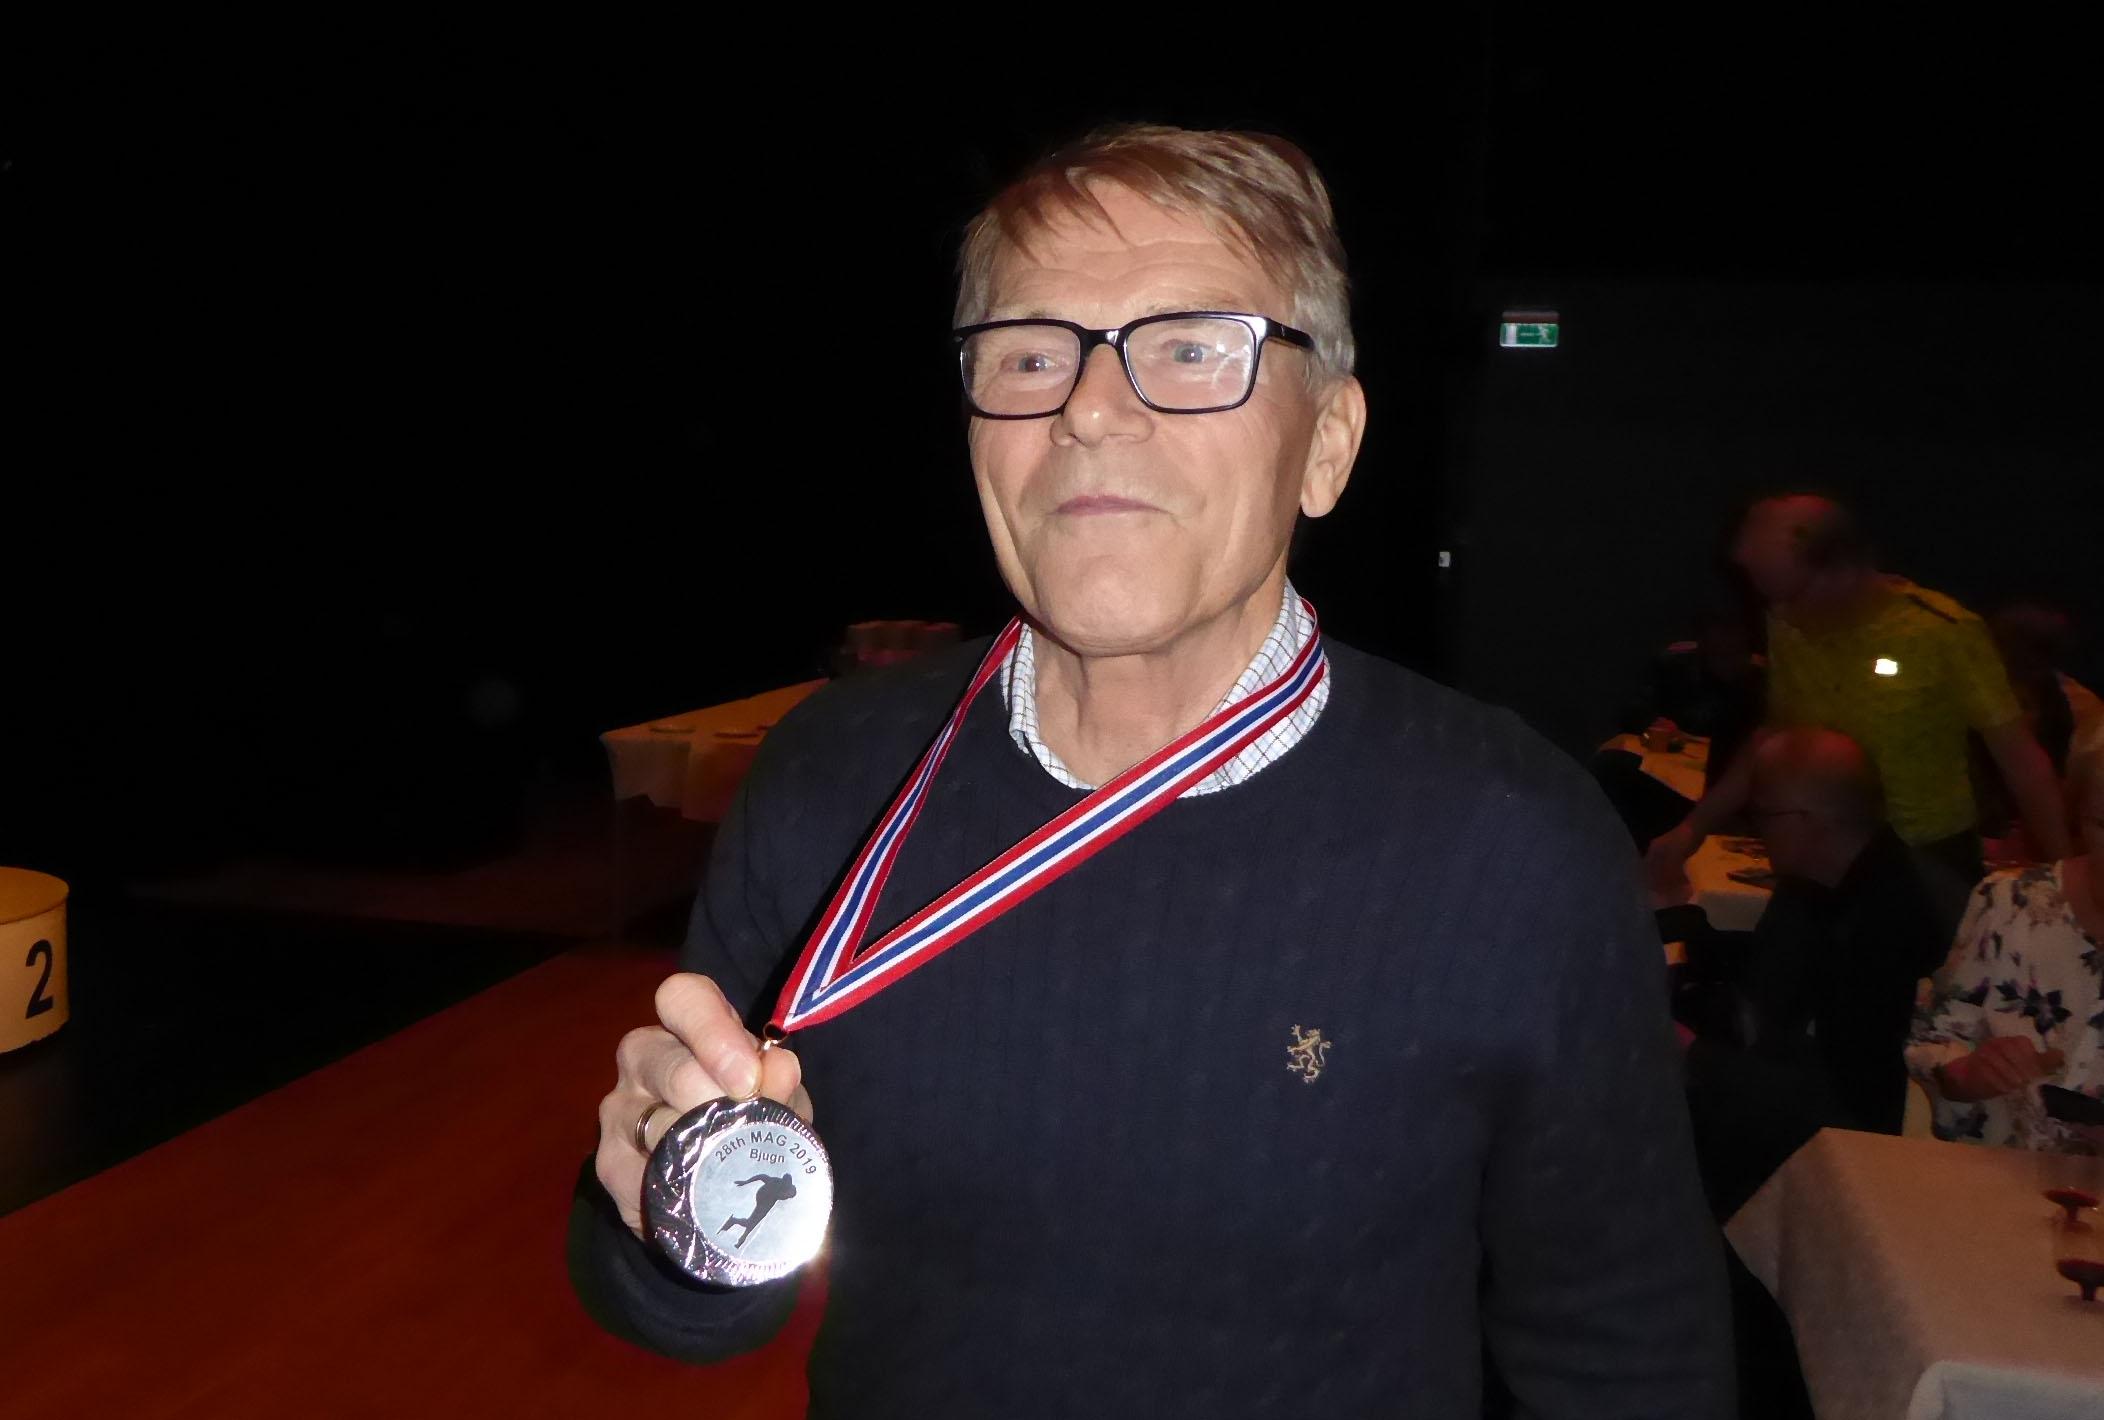 Erik Vea med sølvmedaljen. Martin Grothe Lien og Andreas Haugerud måtte reise før premieutdelingen (Foto: Sven-Åge Svensson)